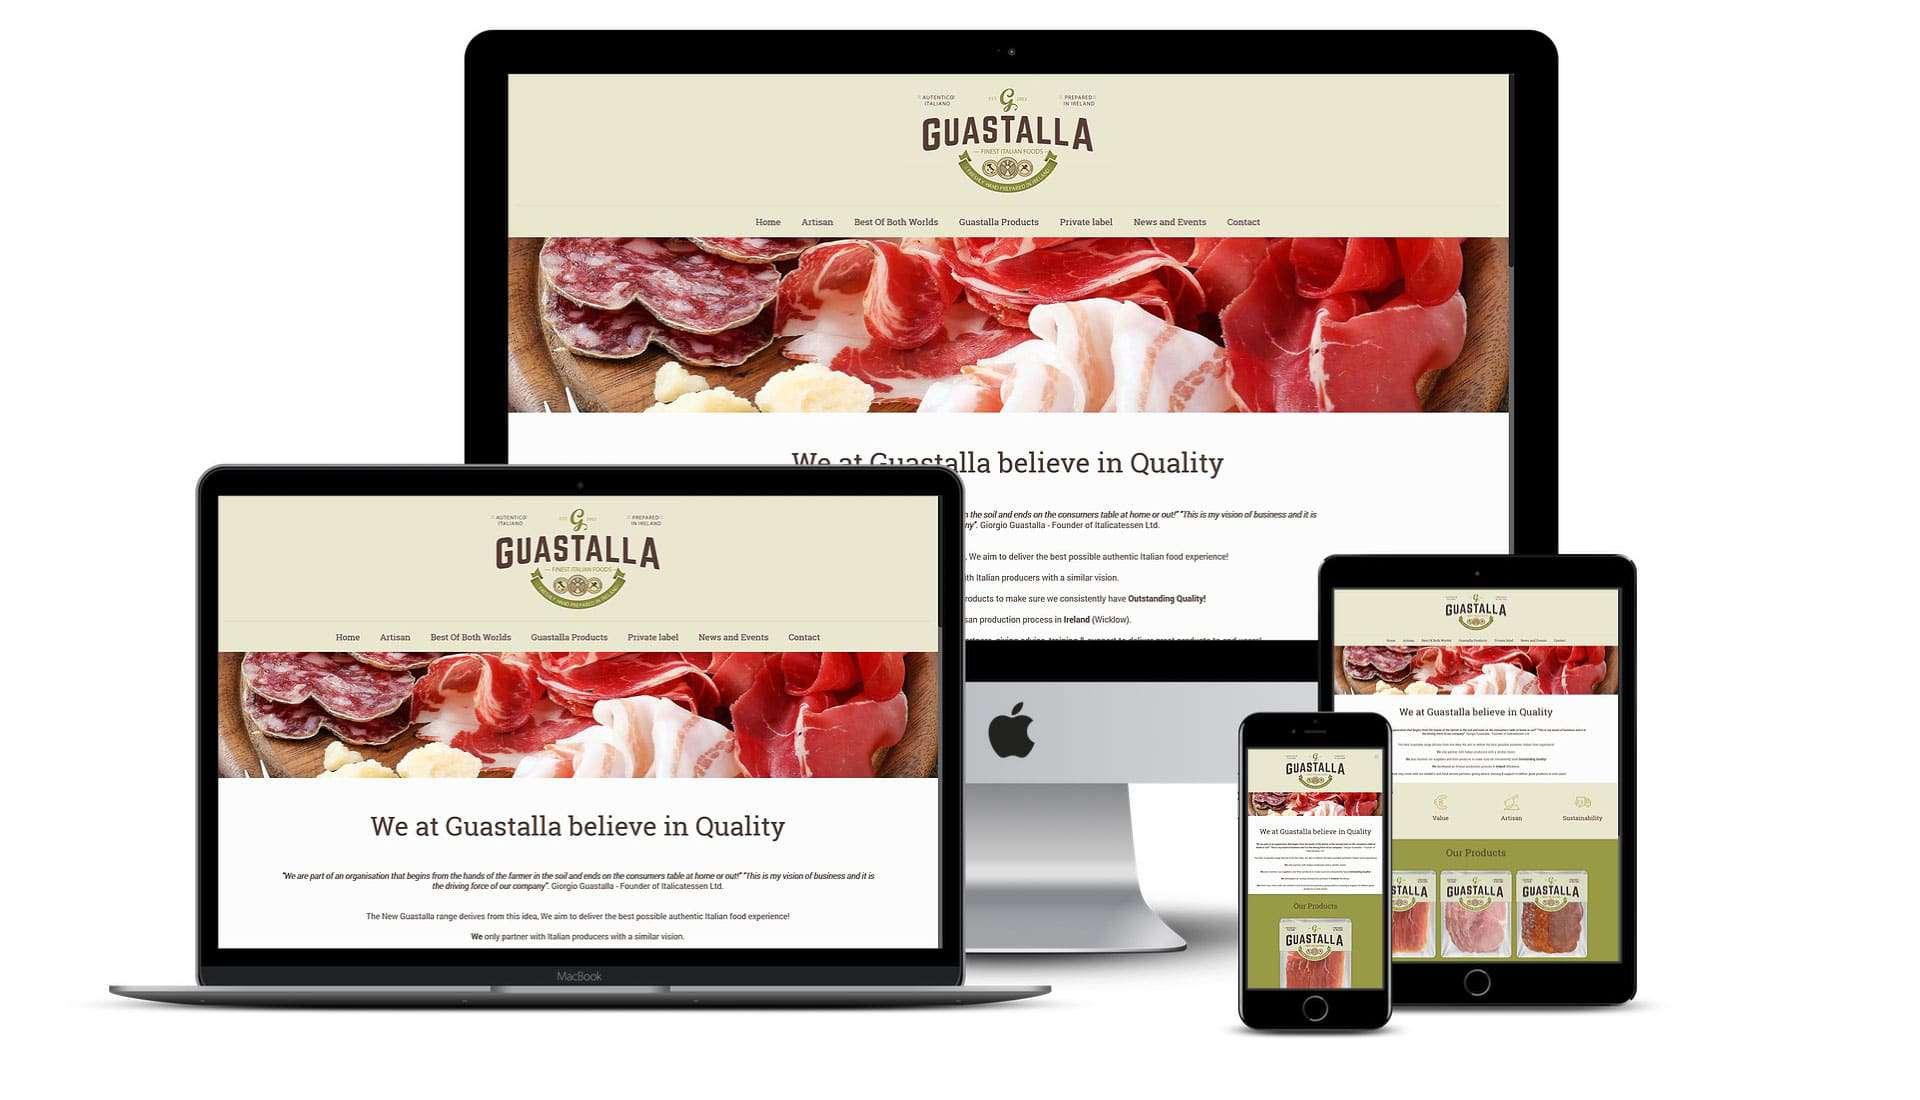 Guastalla